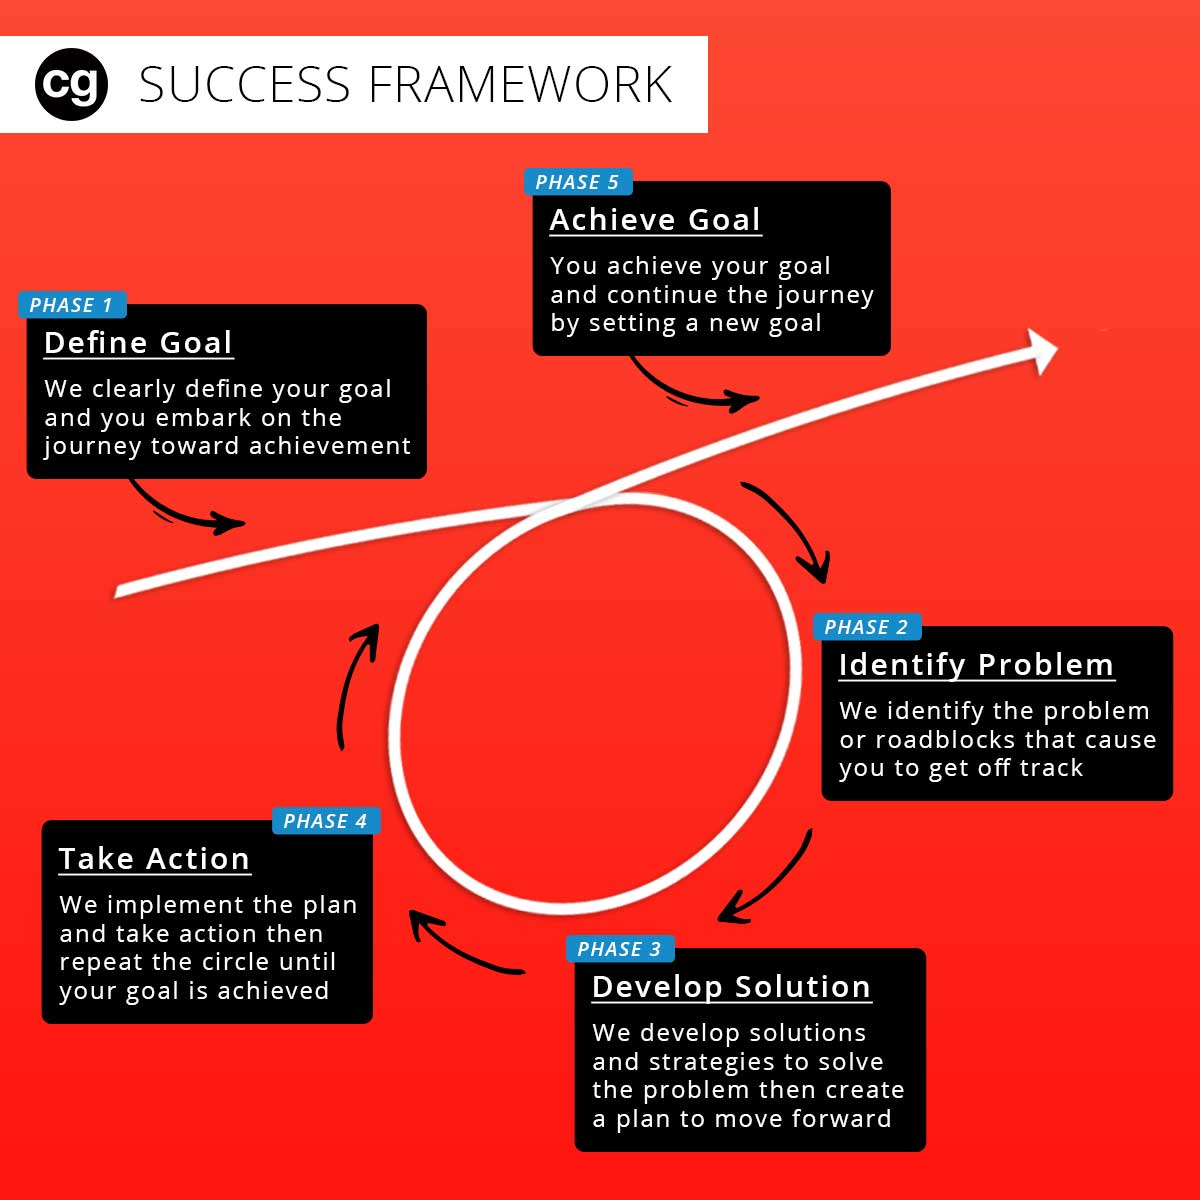 achieve success framework guide business coach coach corey gonzalez (cg)